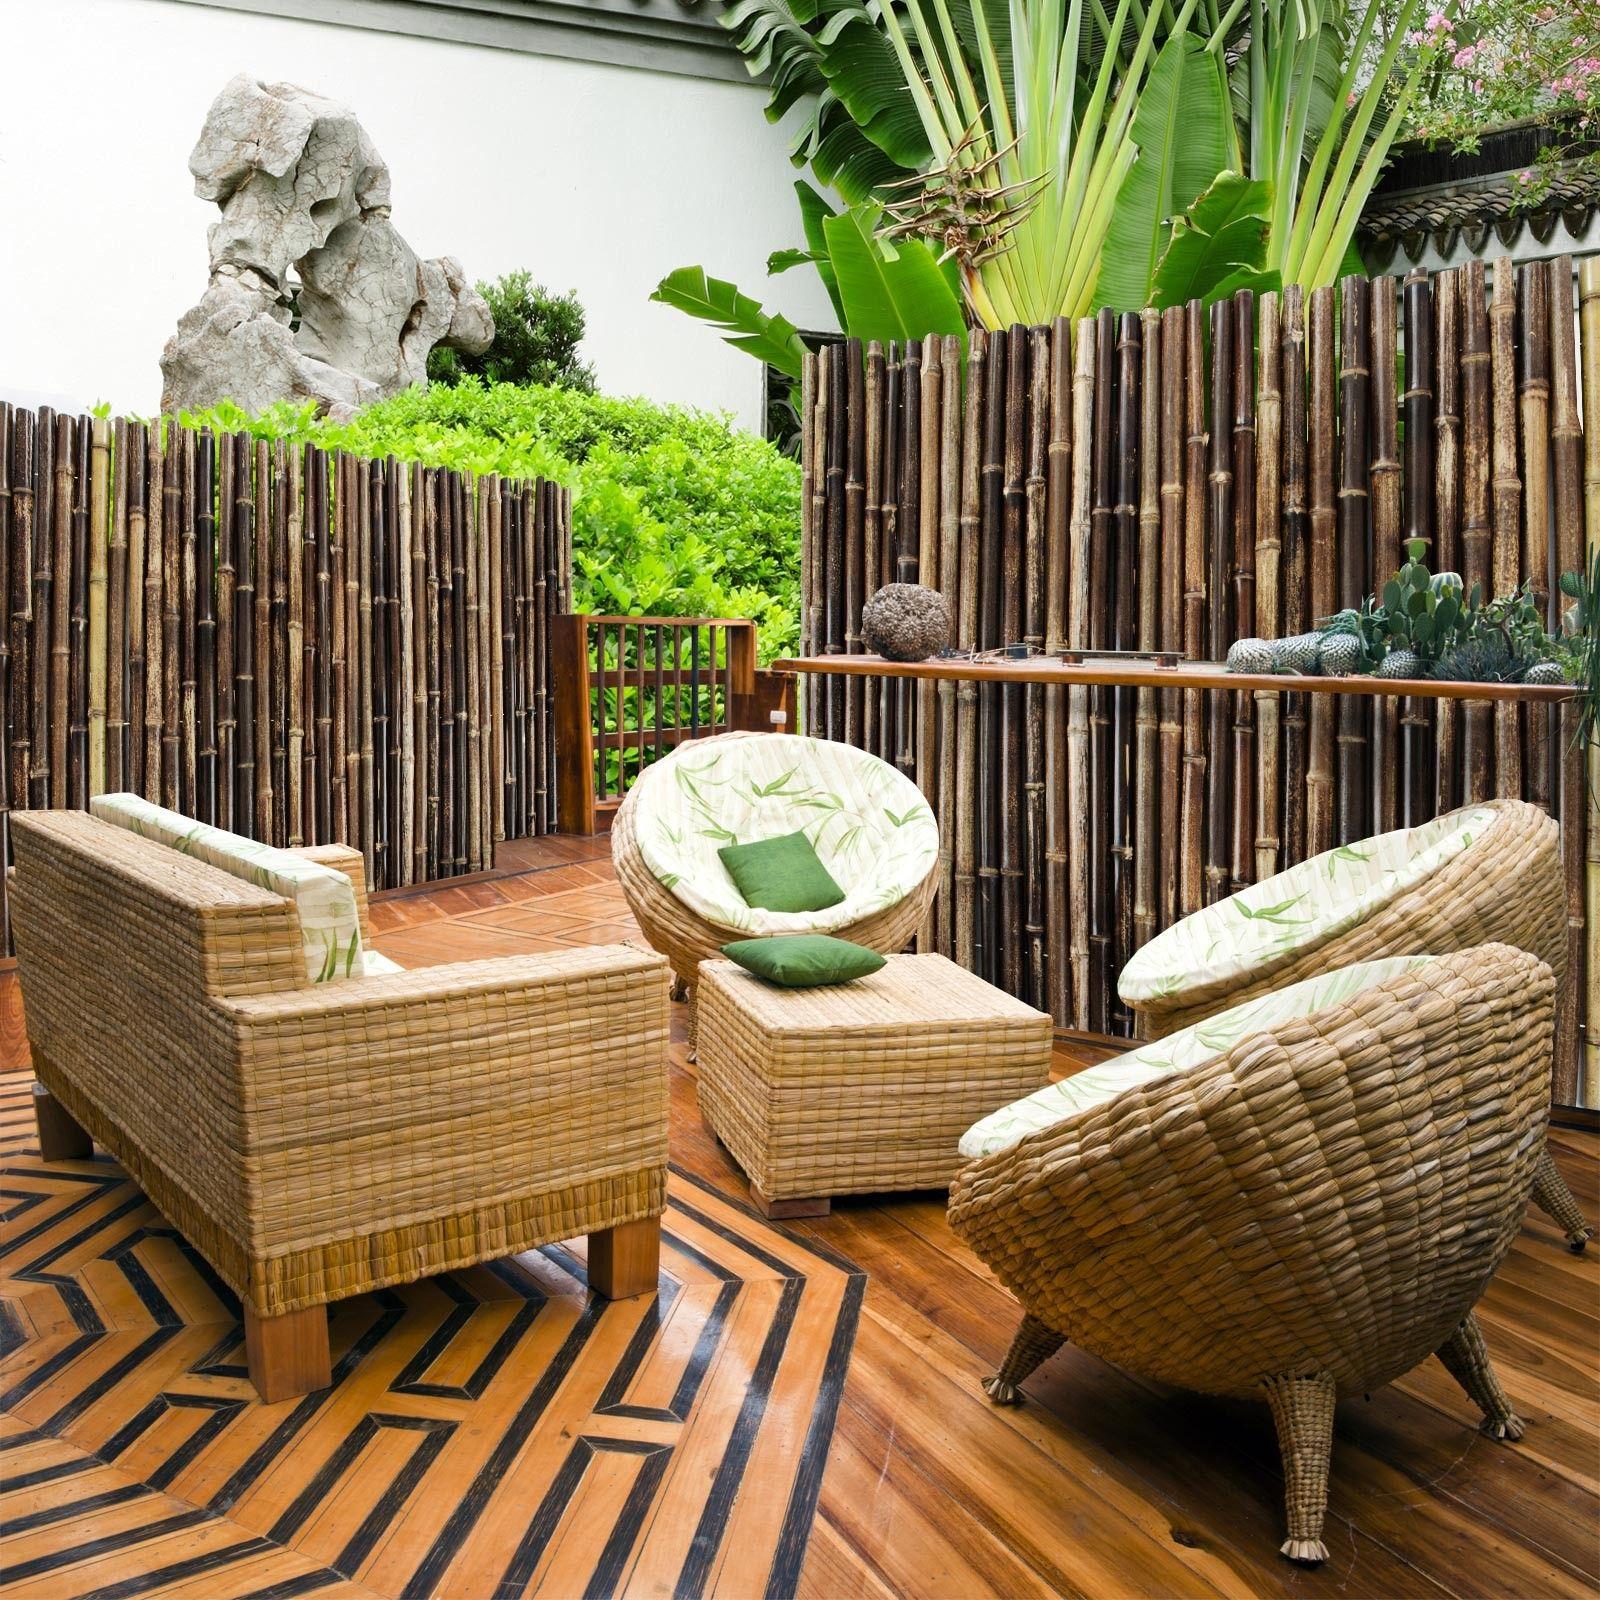 bambuszaun schwarz 3 gr en phyllostachys nigra. Black Bedroom Furniture Sets. Home Design Ideas